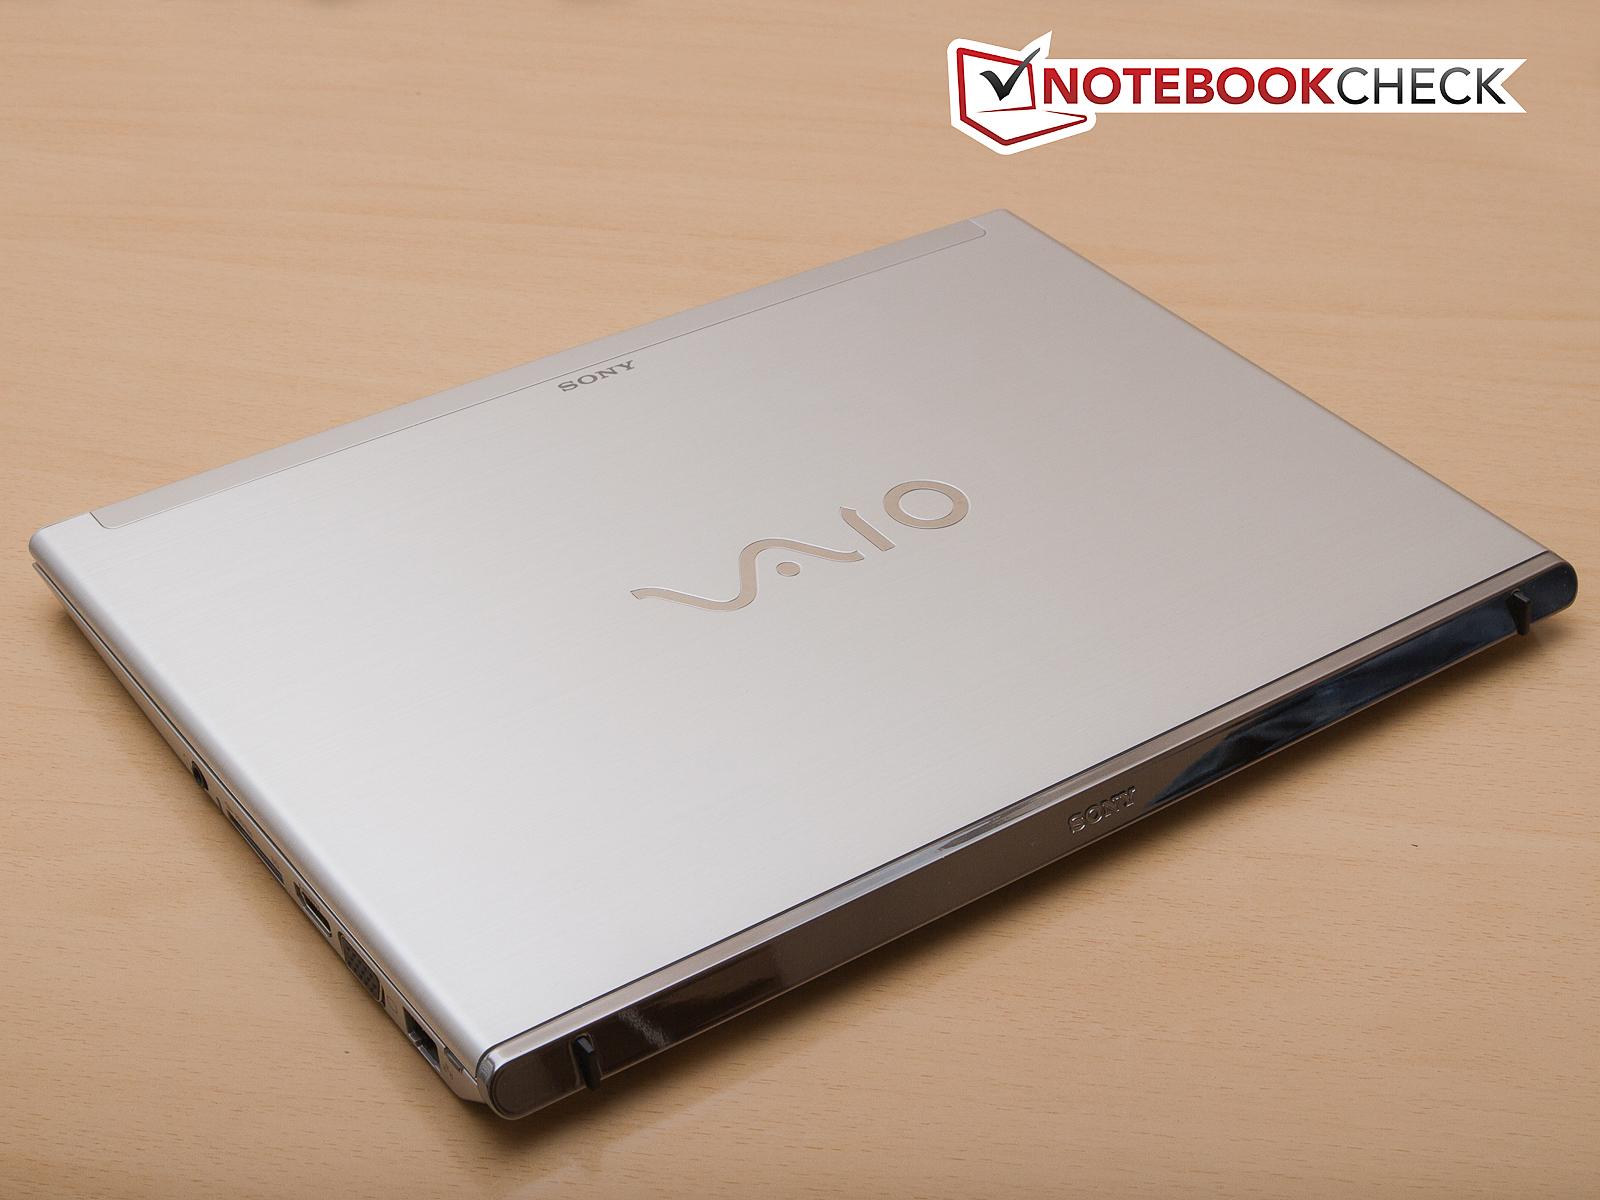 Sony vaio t13 ultrabook review the register - Verdict